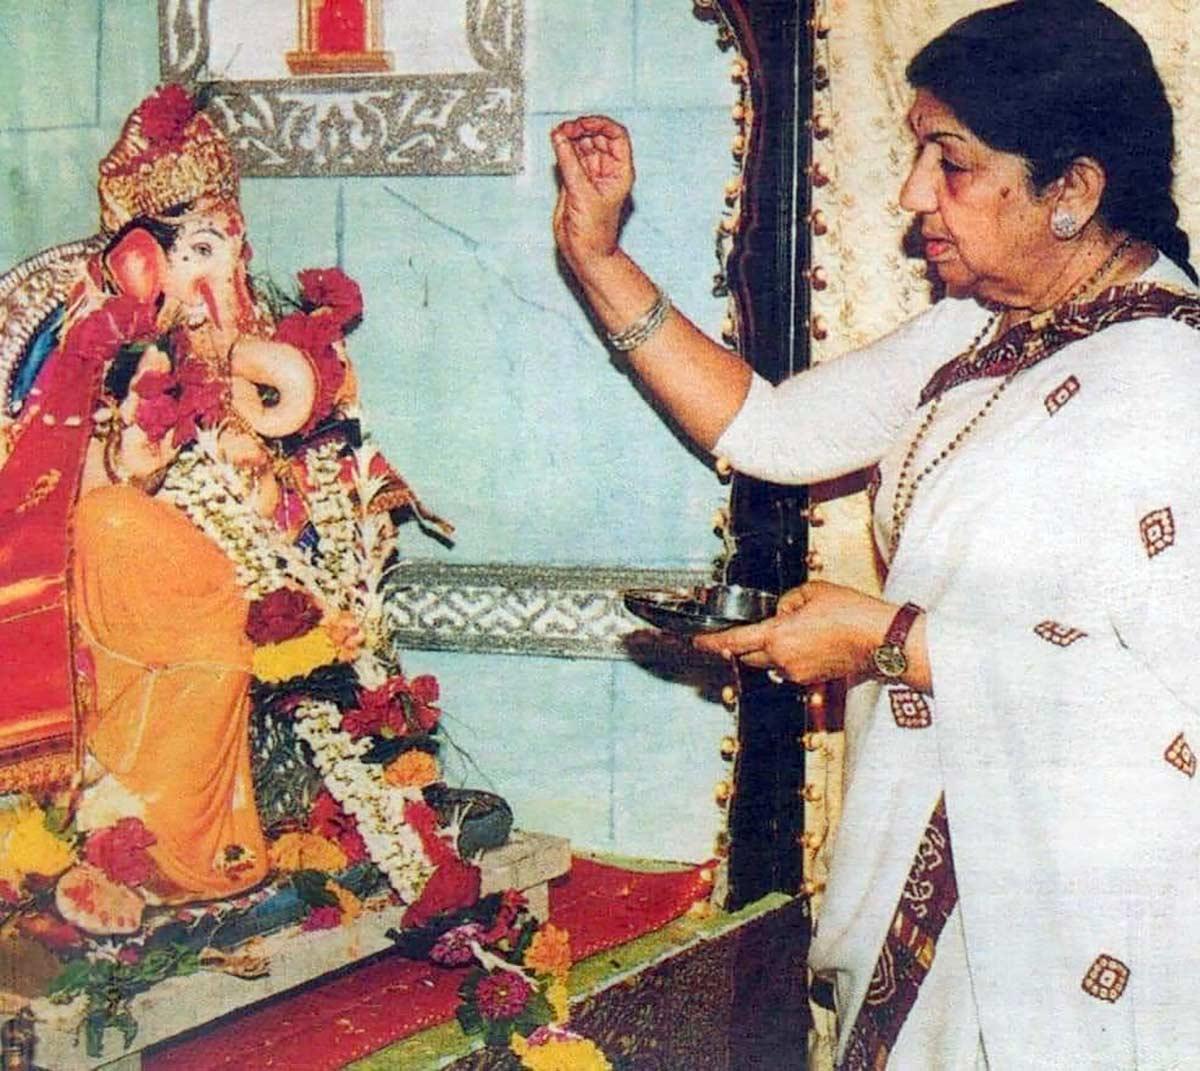 The Lata Mangeshkar Interview